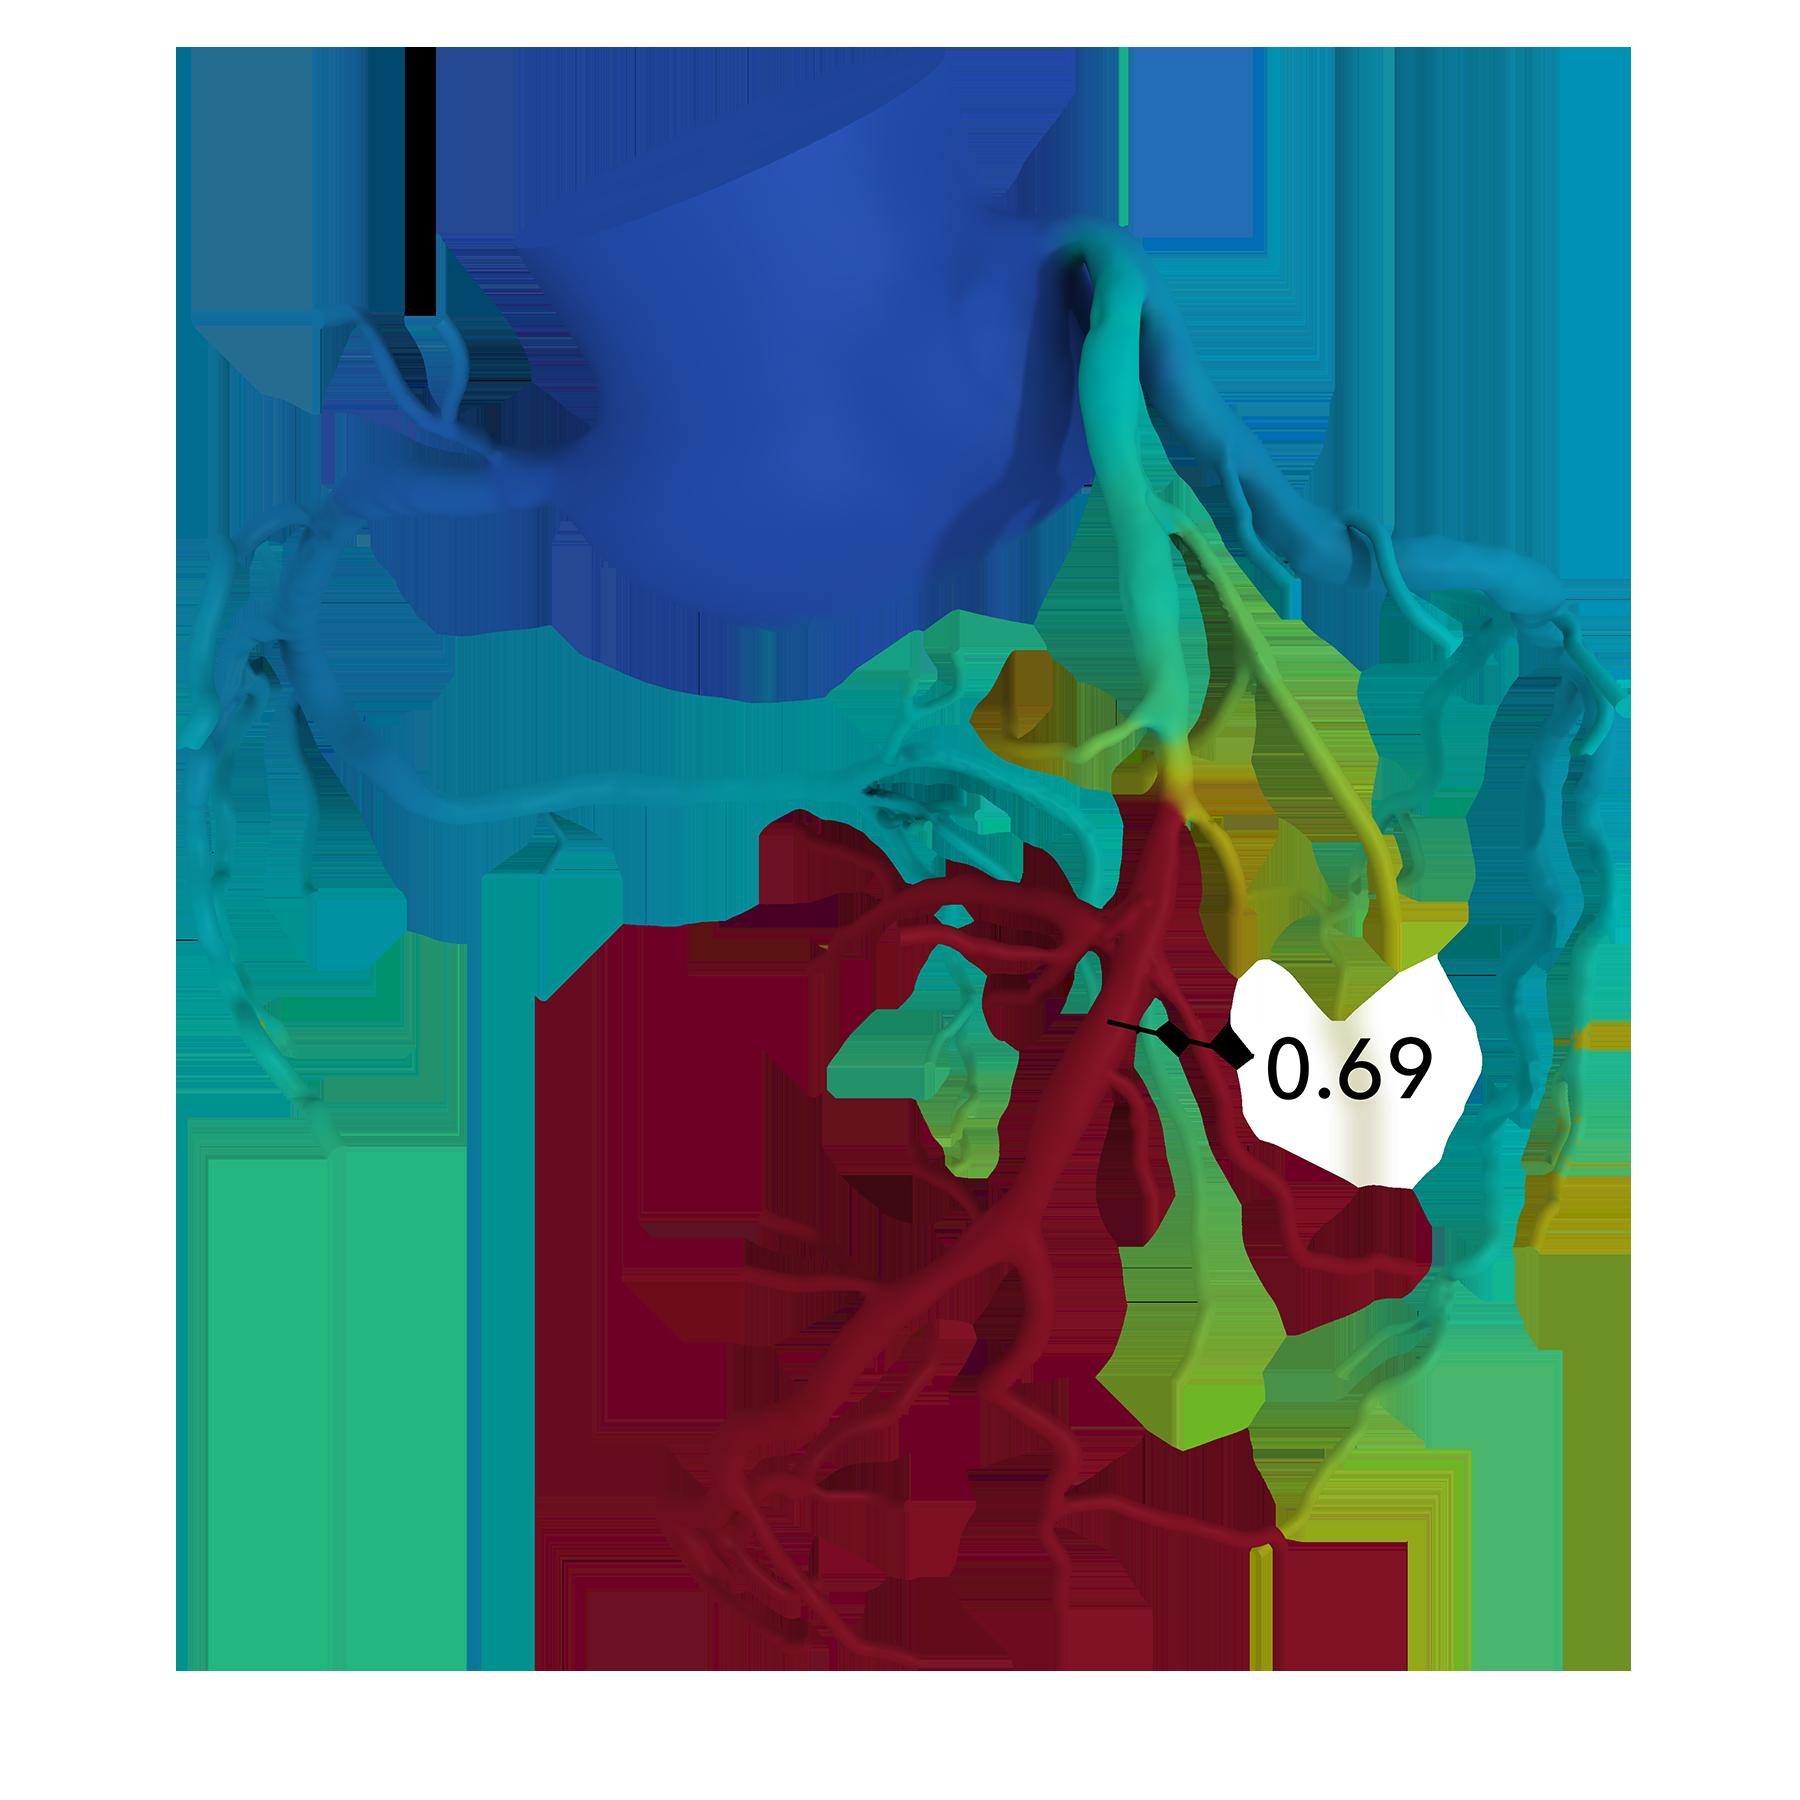 HeartFlow 3D Color Model